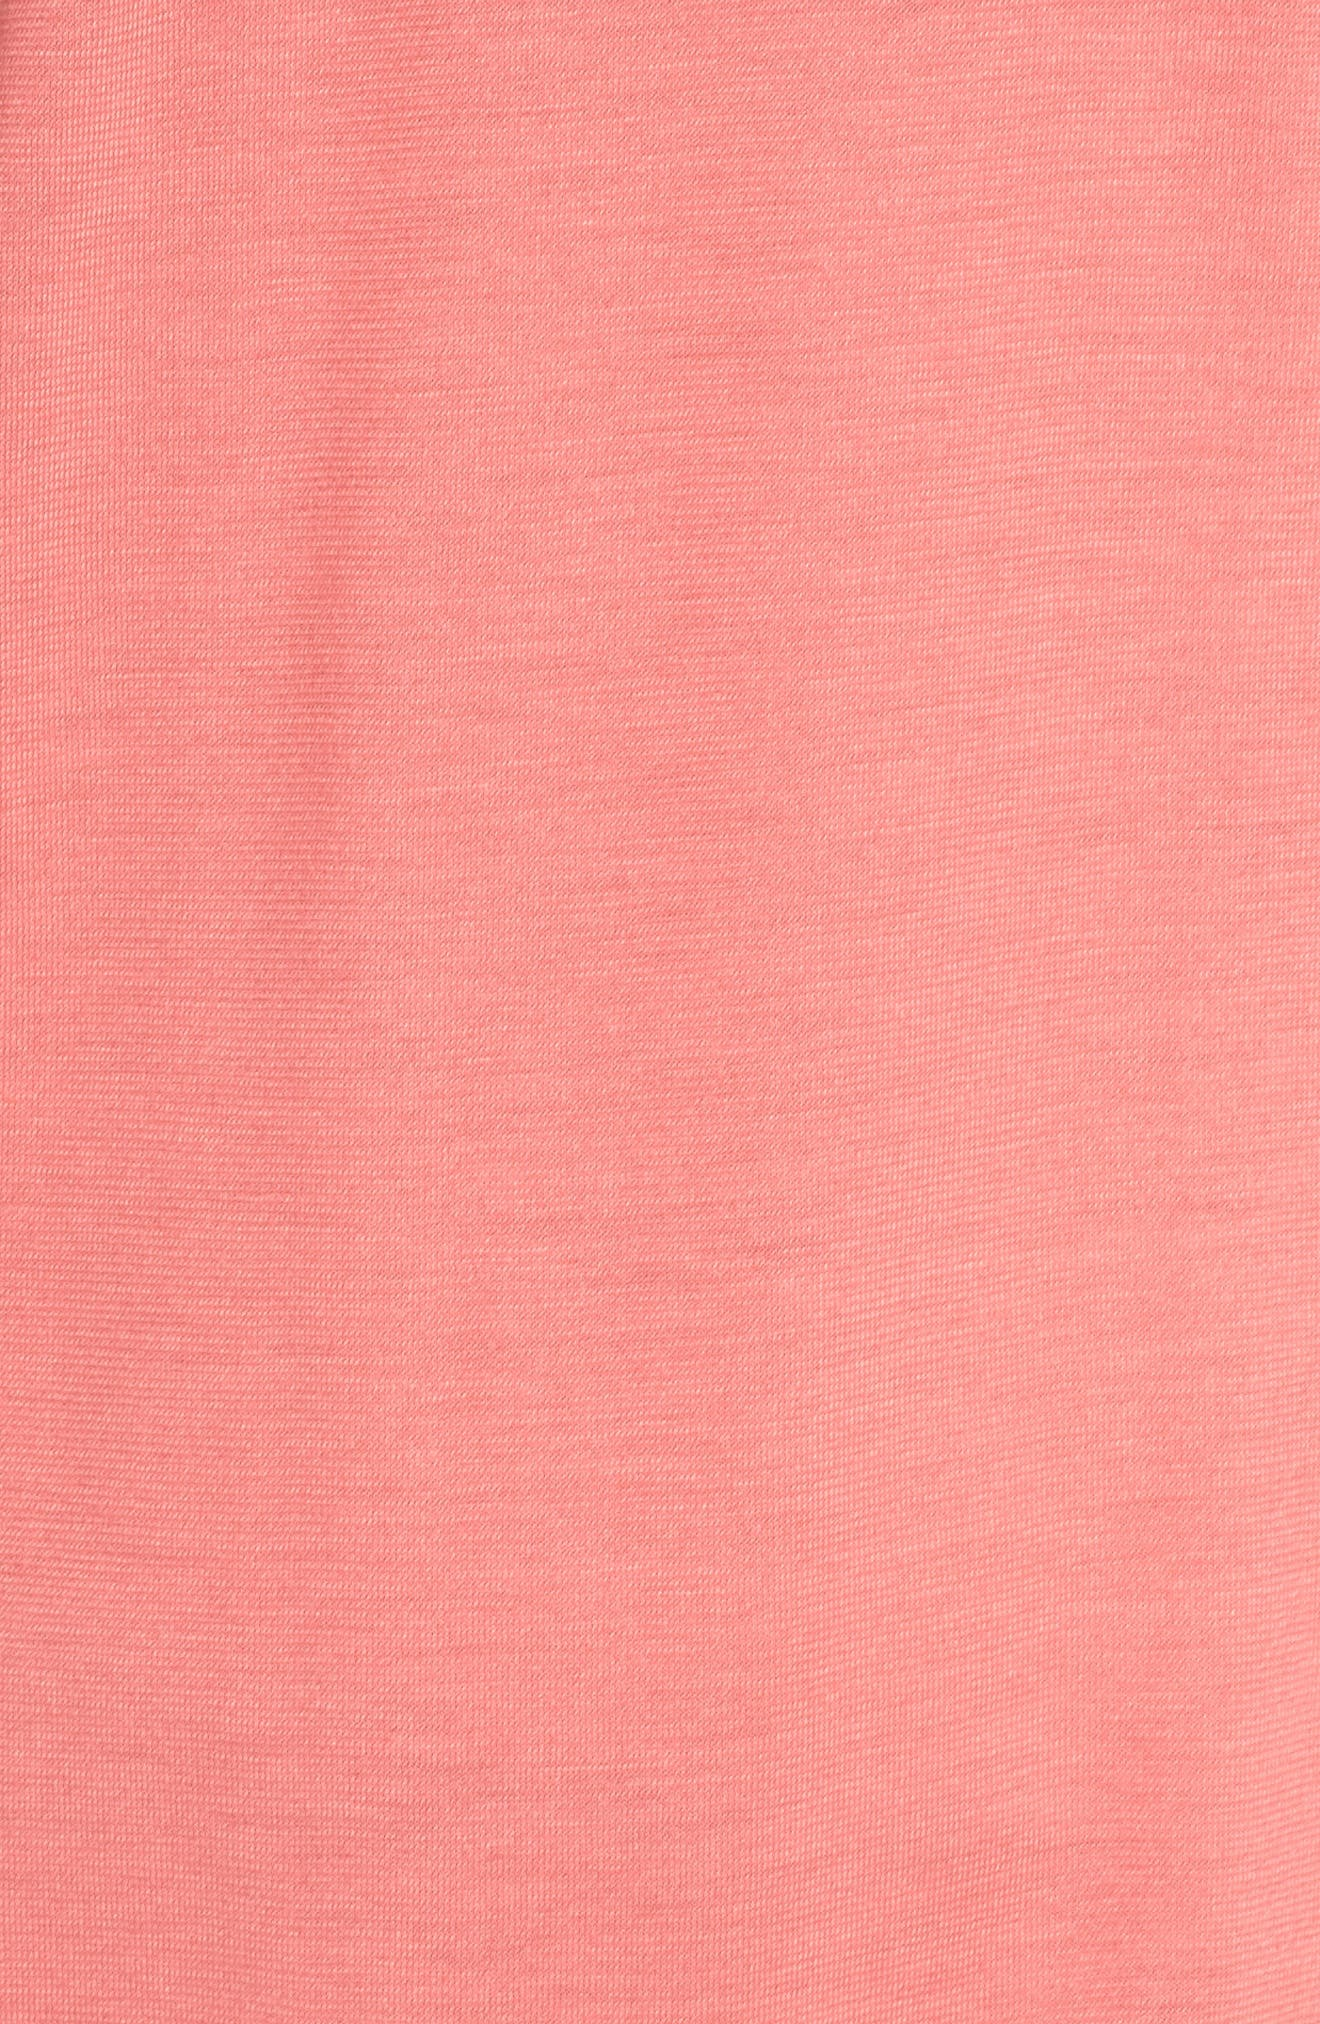 Sportswear Essential Tee,                             Alternate thumbnail 6, color,                             Sea Coral/ Sea Coral/ Black